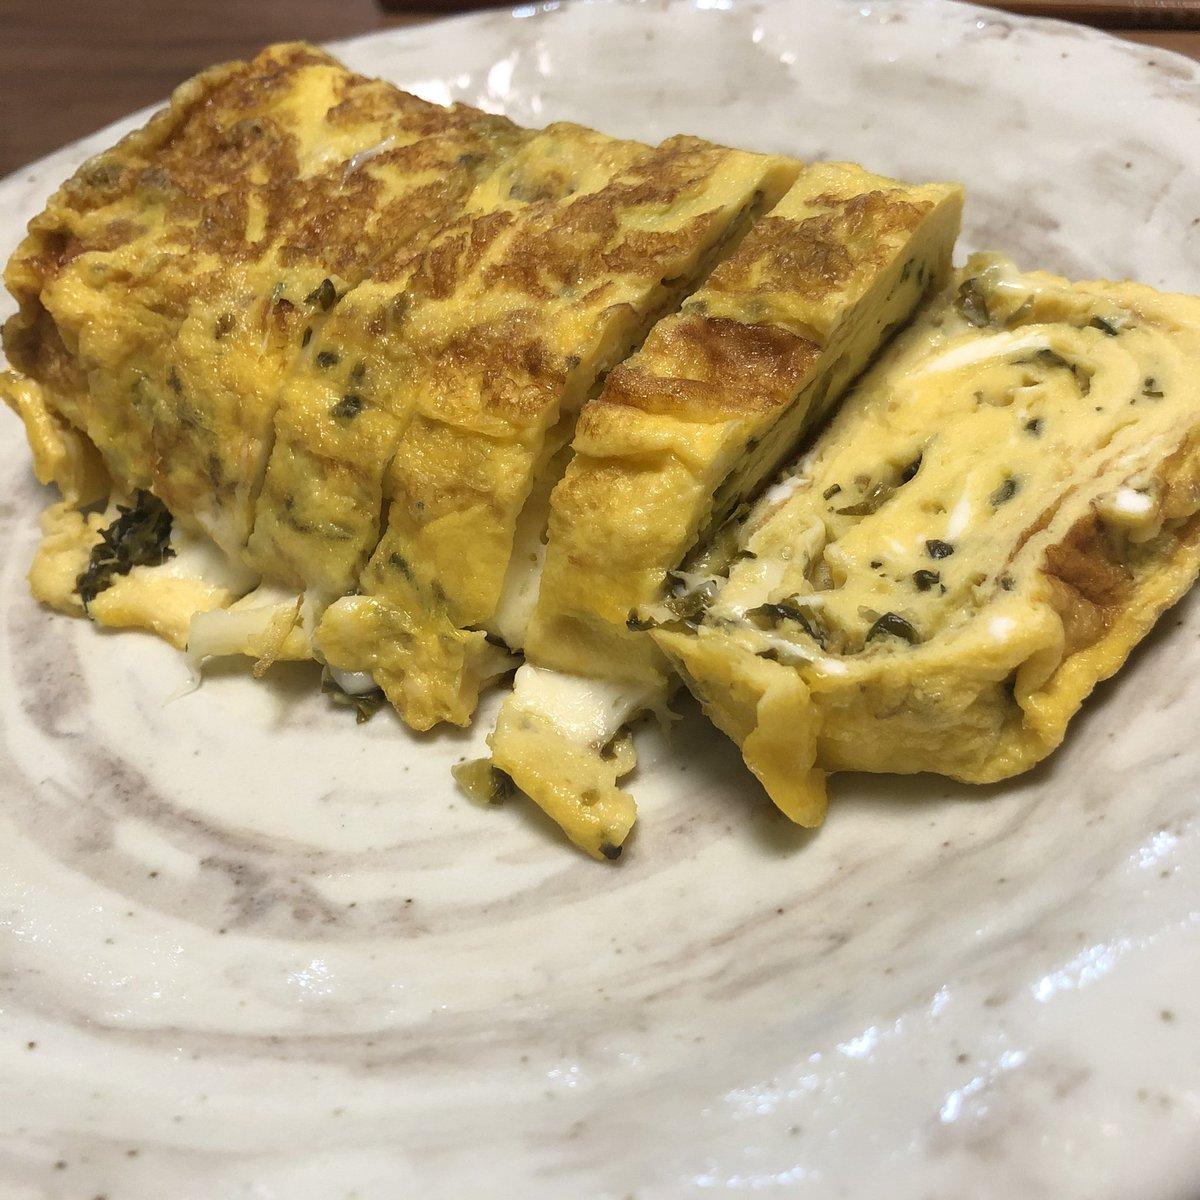 test ツイッターメディア - チーズ🧀高菜inだし巻き  が上手くできたのと  オイシックスの金目鯛と菜花の 炊き込みご飯🌸  の宣伝✨  #オイシックス https://t.co/g5x8LJd4EJ